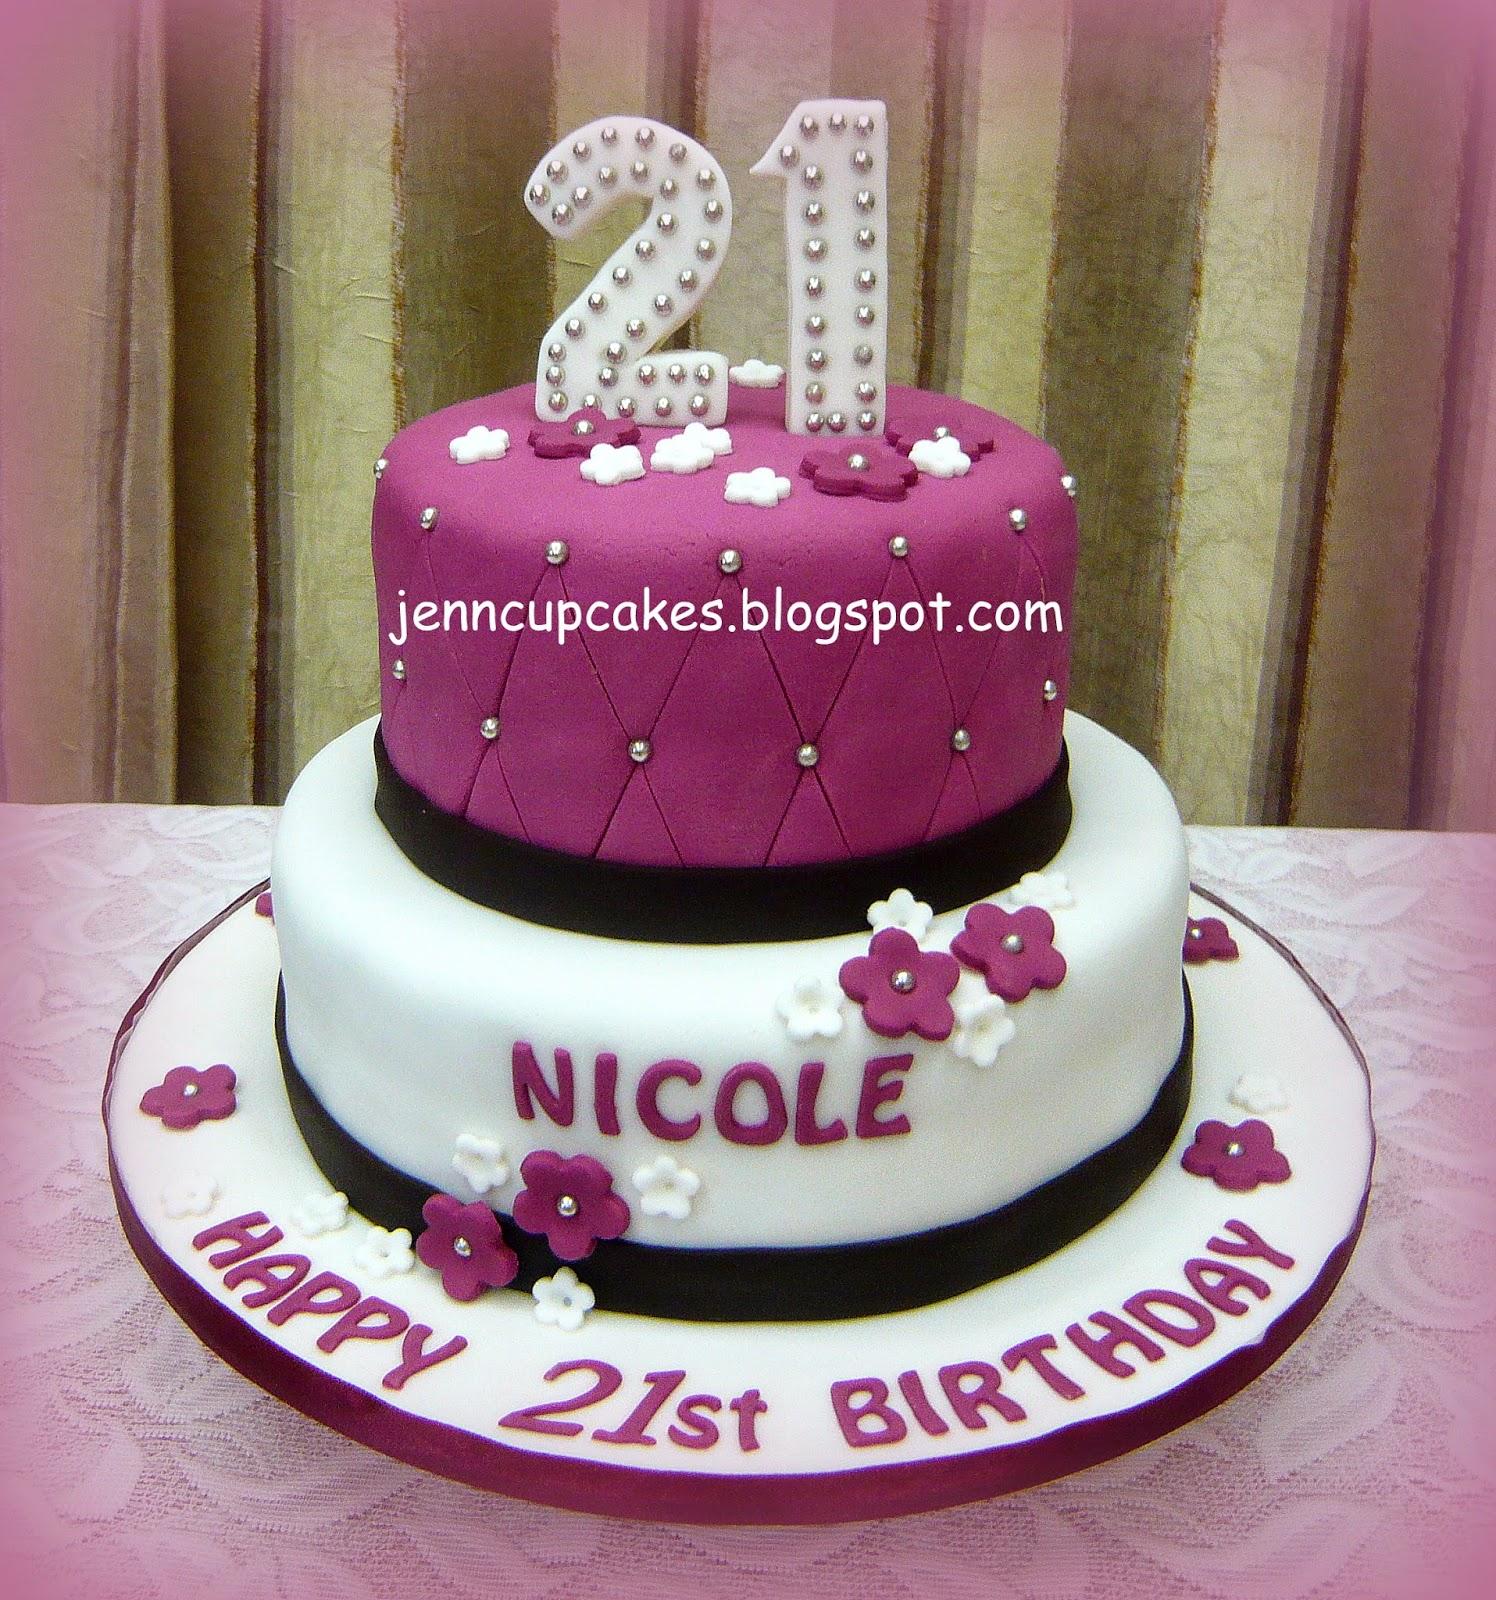 Jenn Cupcakes Muffins 21st Birthday Cake